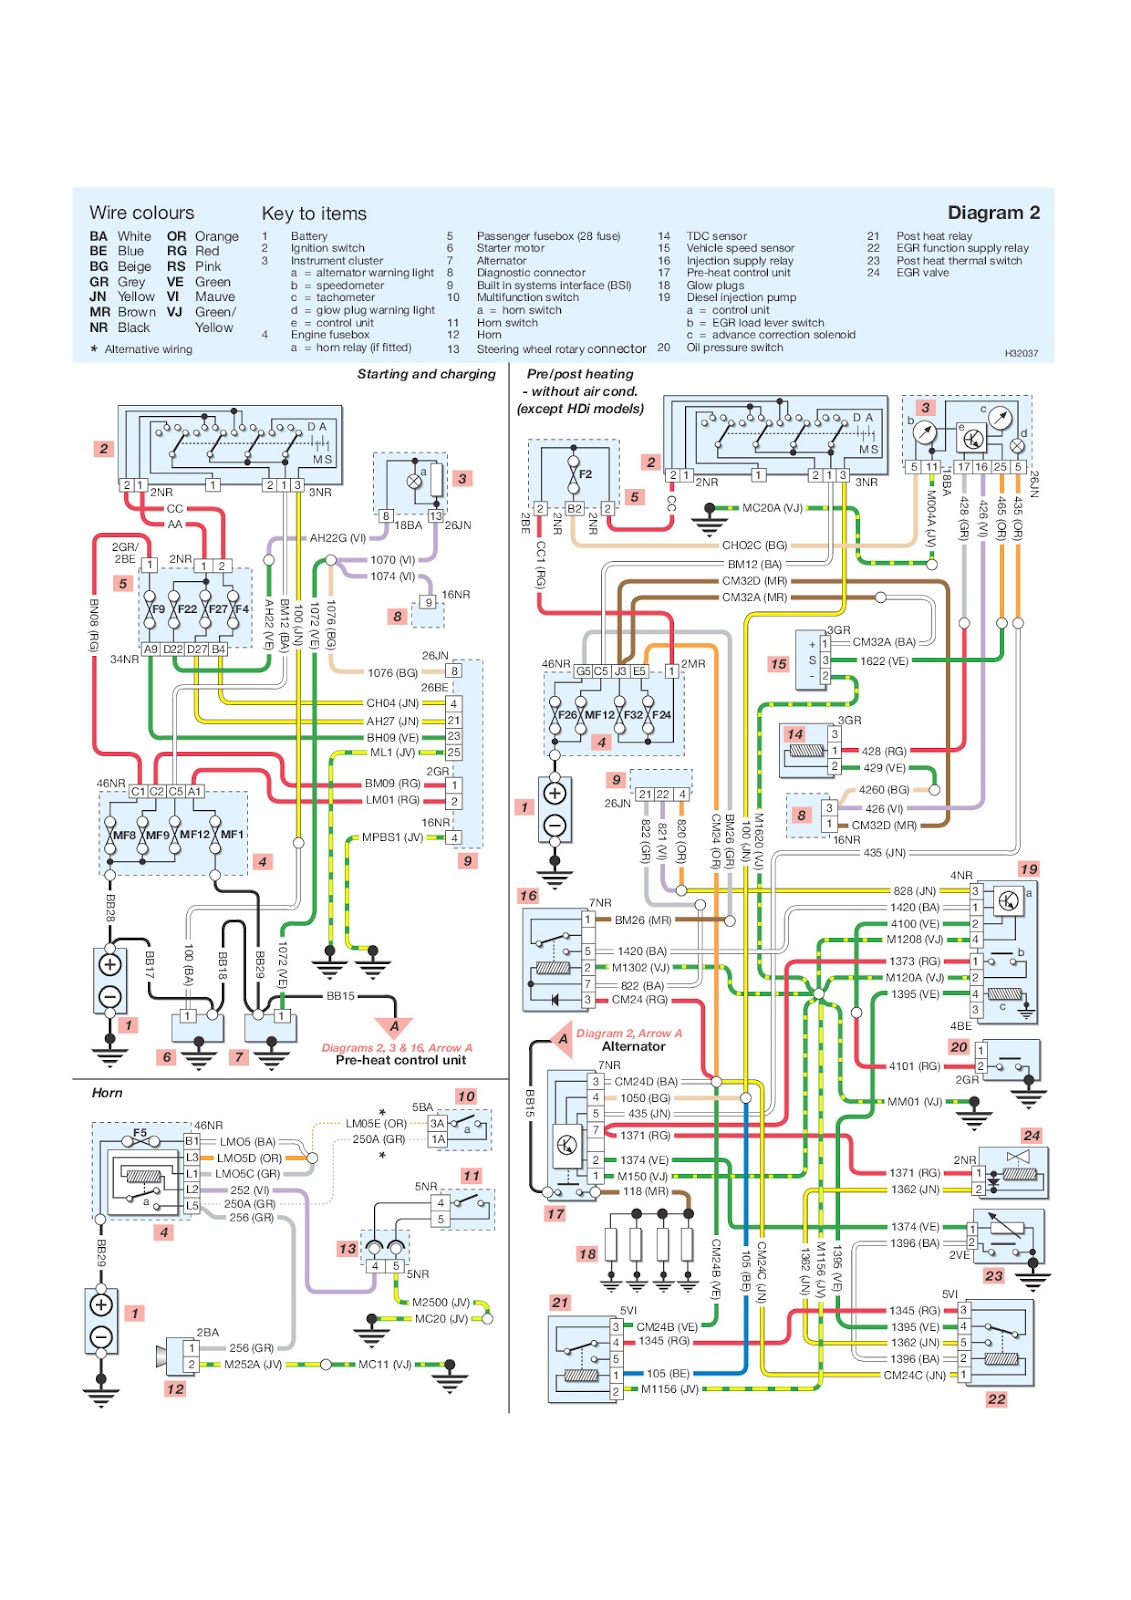 Fuse Box Car Wiring Diagram Page 395 - Wiring Diagrams Schematics